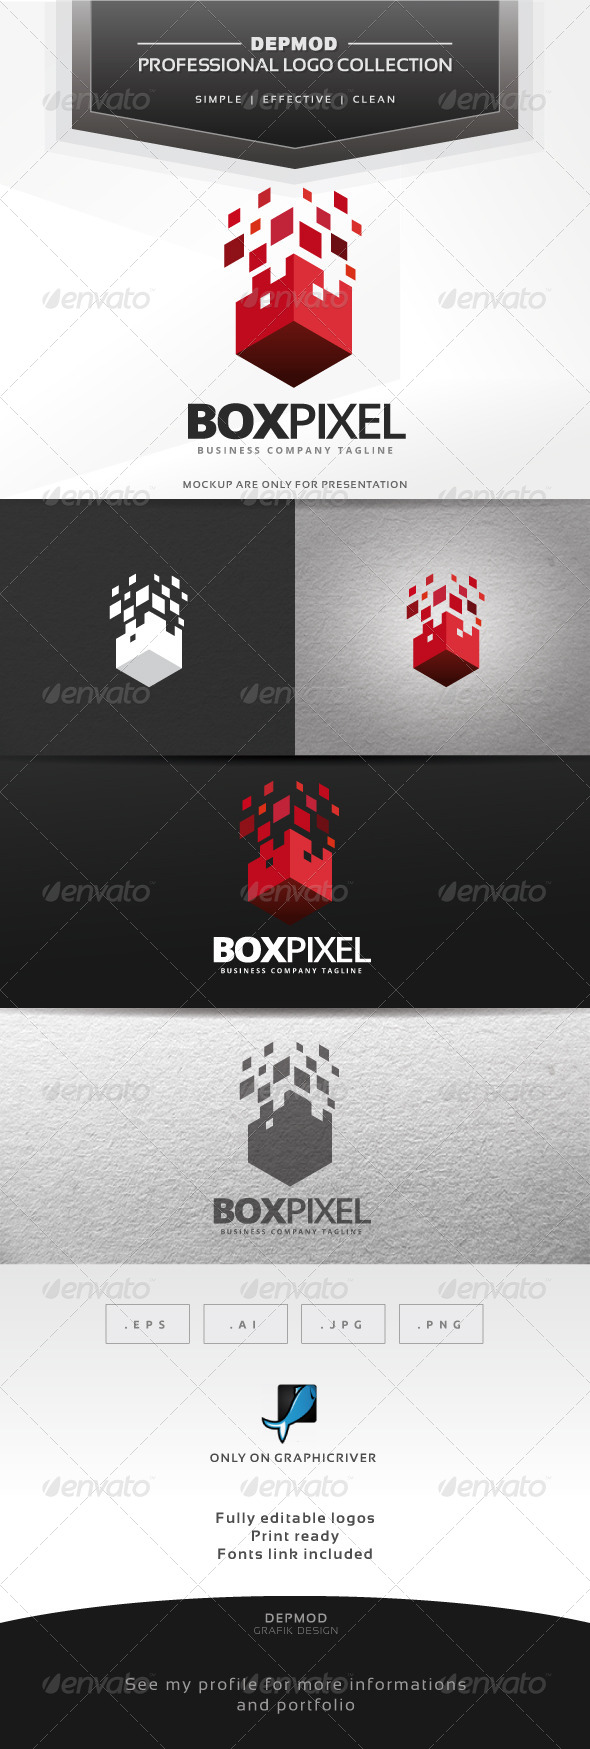 GraphicRiver Box Pixel Logo 6942404